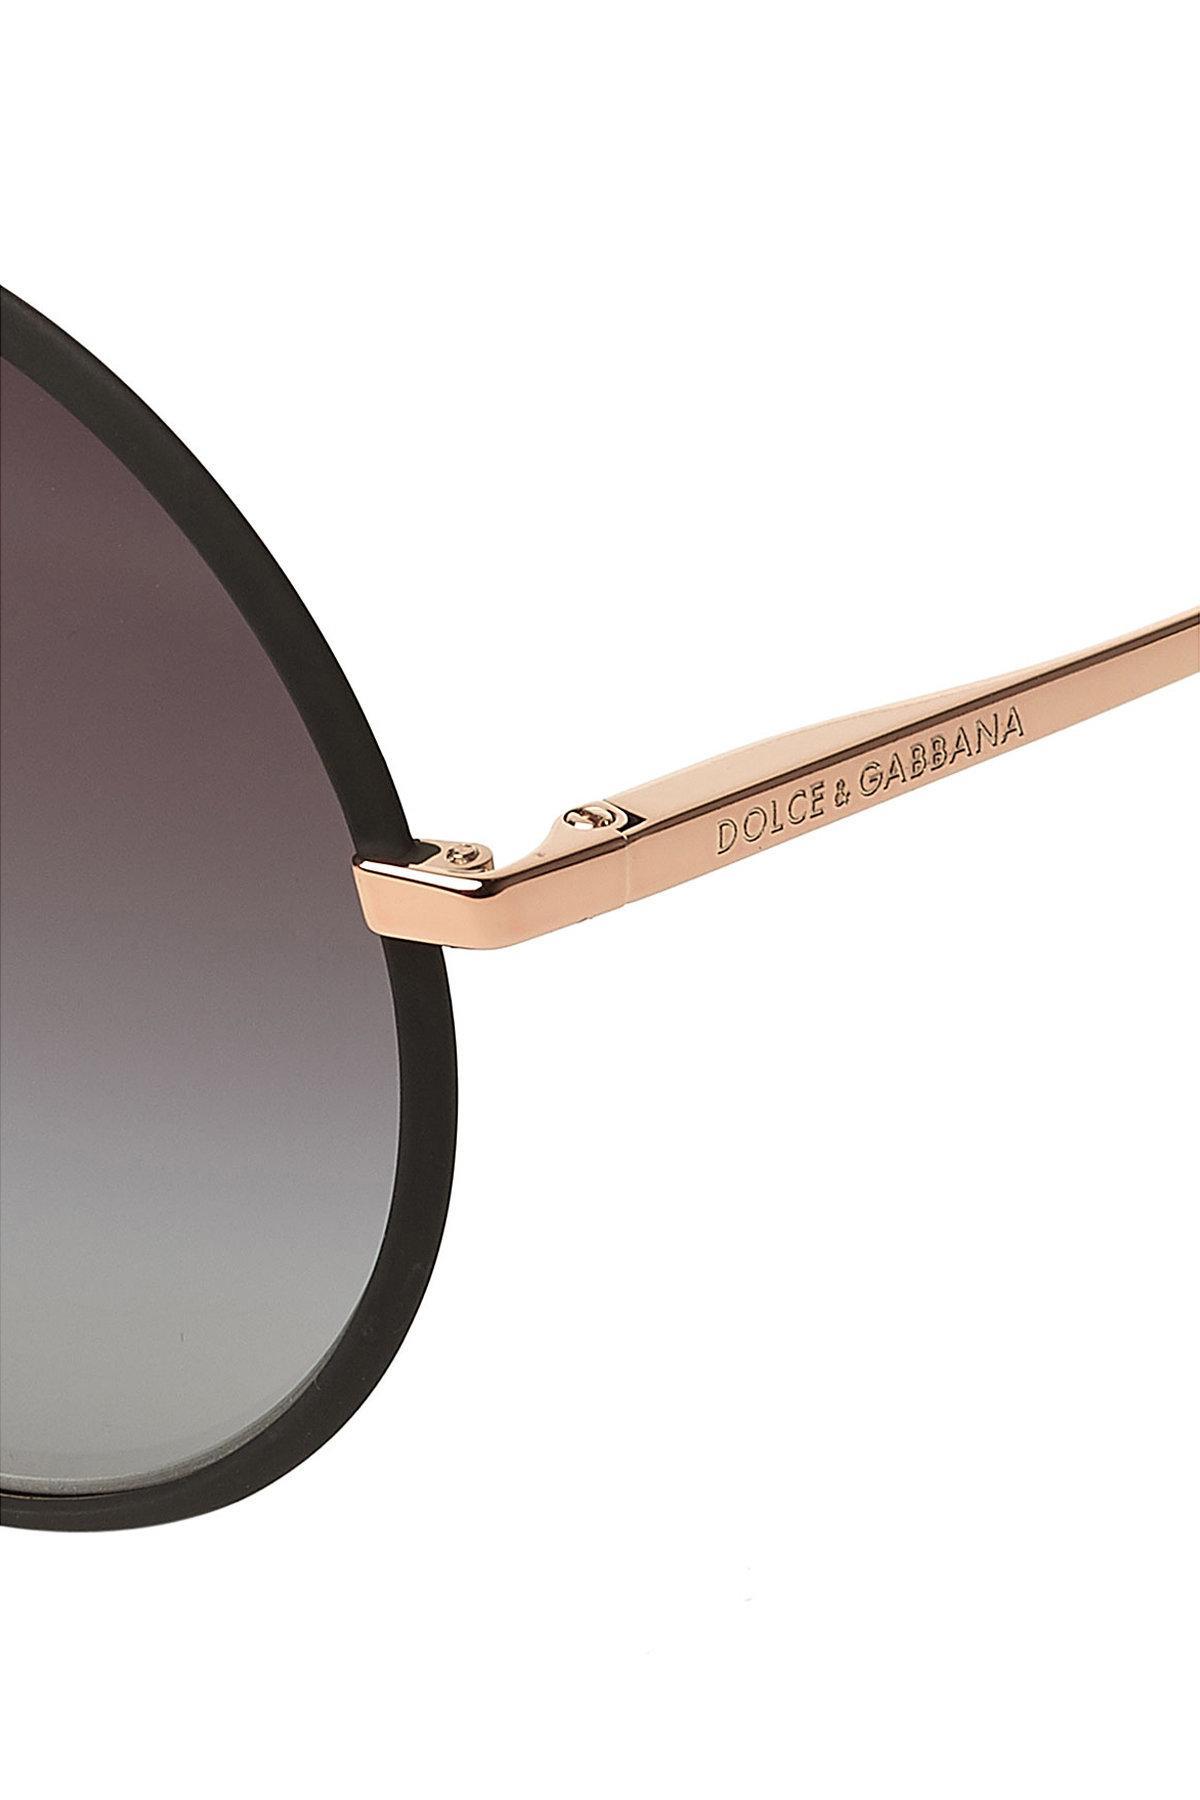 46ef2f75236 Dolce   Gabbana 0dg4249 Round Sunglasses